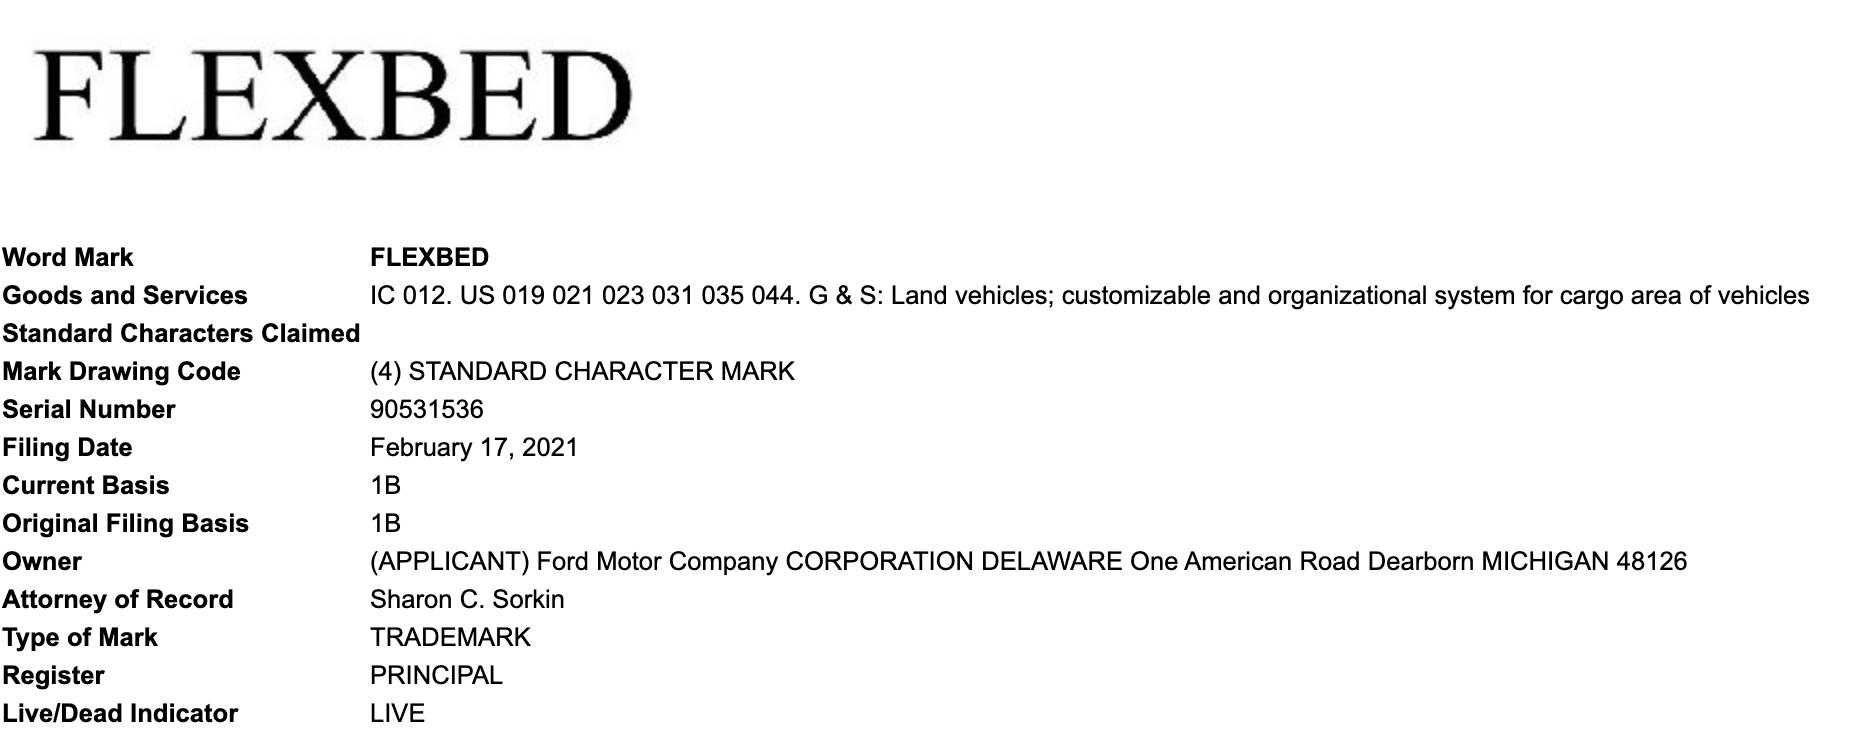 Ford Flexbed Trademark